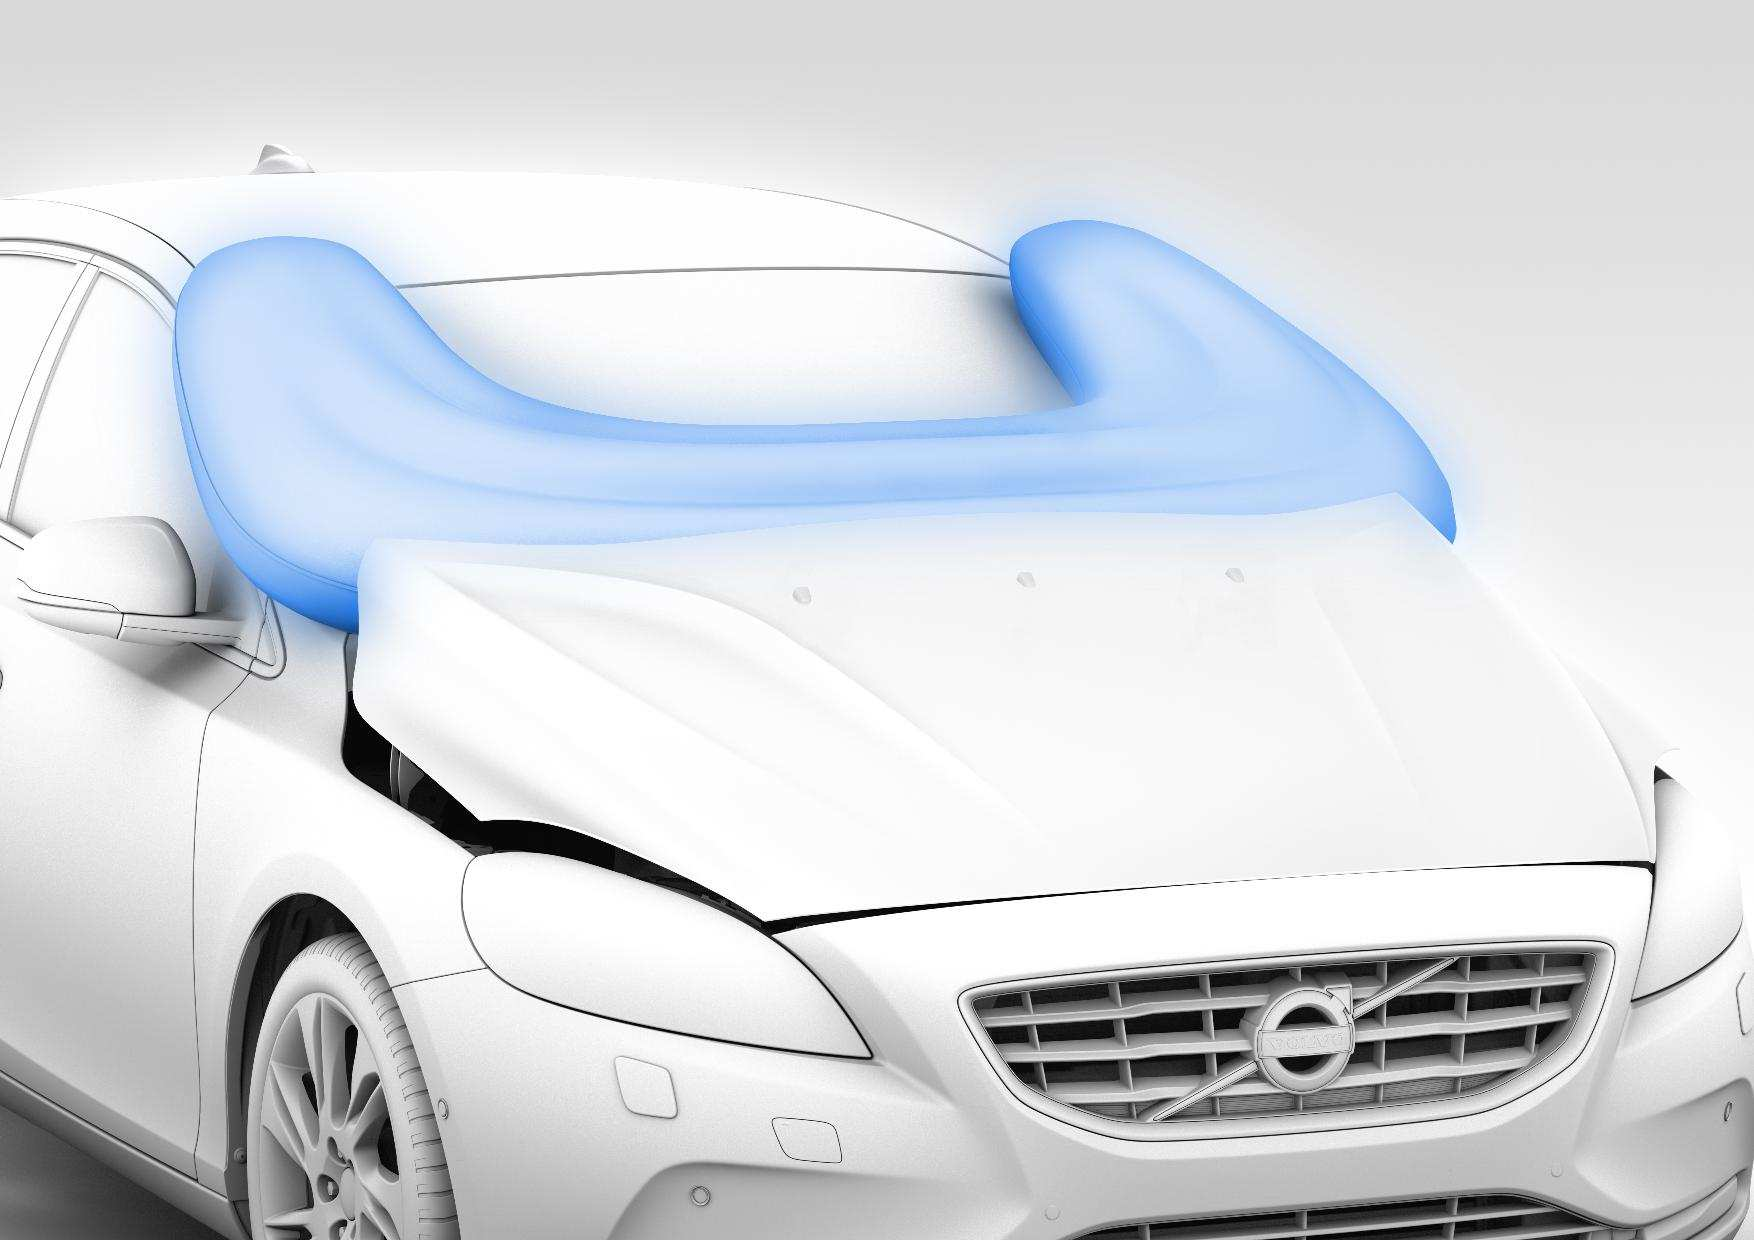 79 New Volvo Crash Proof Car 2020 Images for Volvo Crash Proof Car 2020